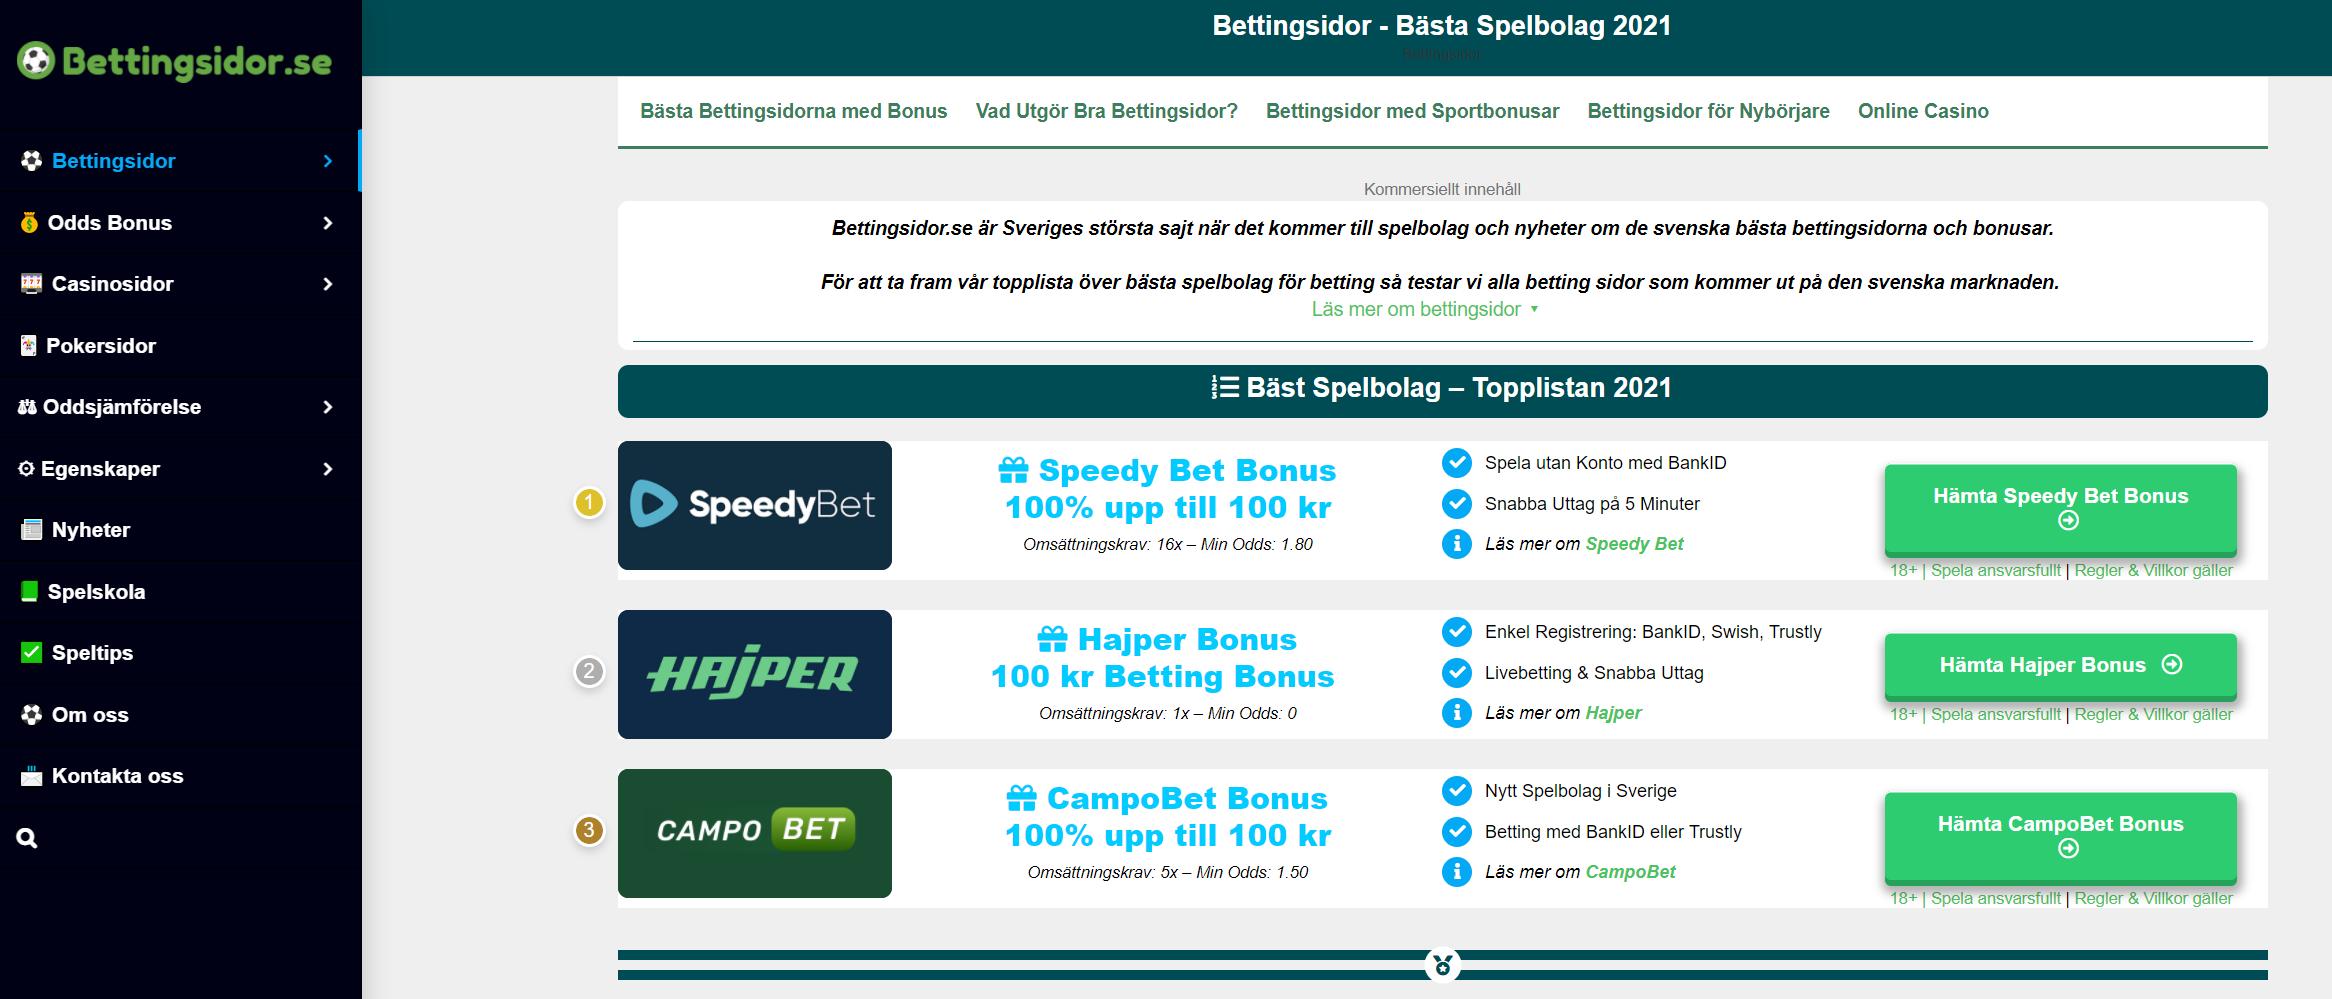 Bettingsidor best odds 62178